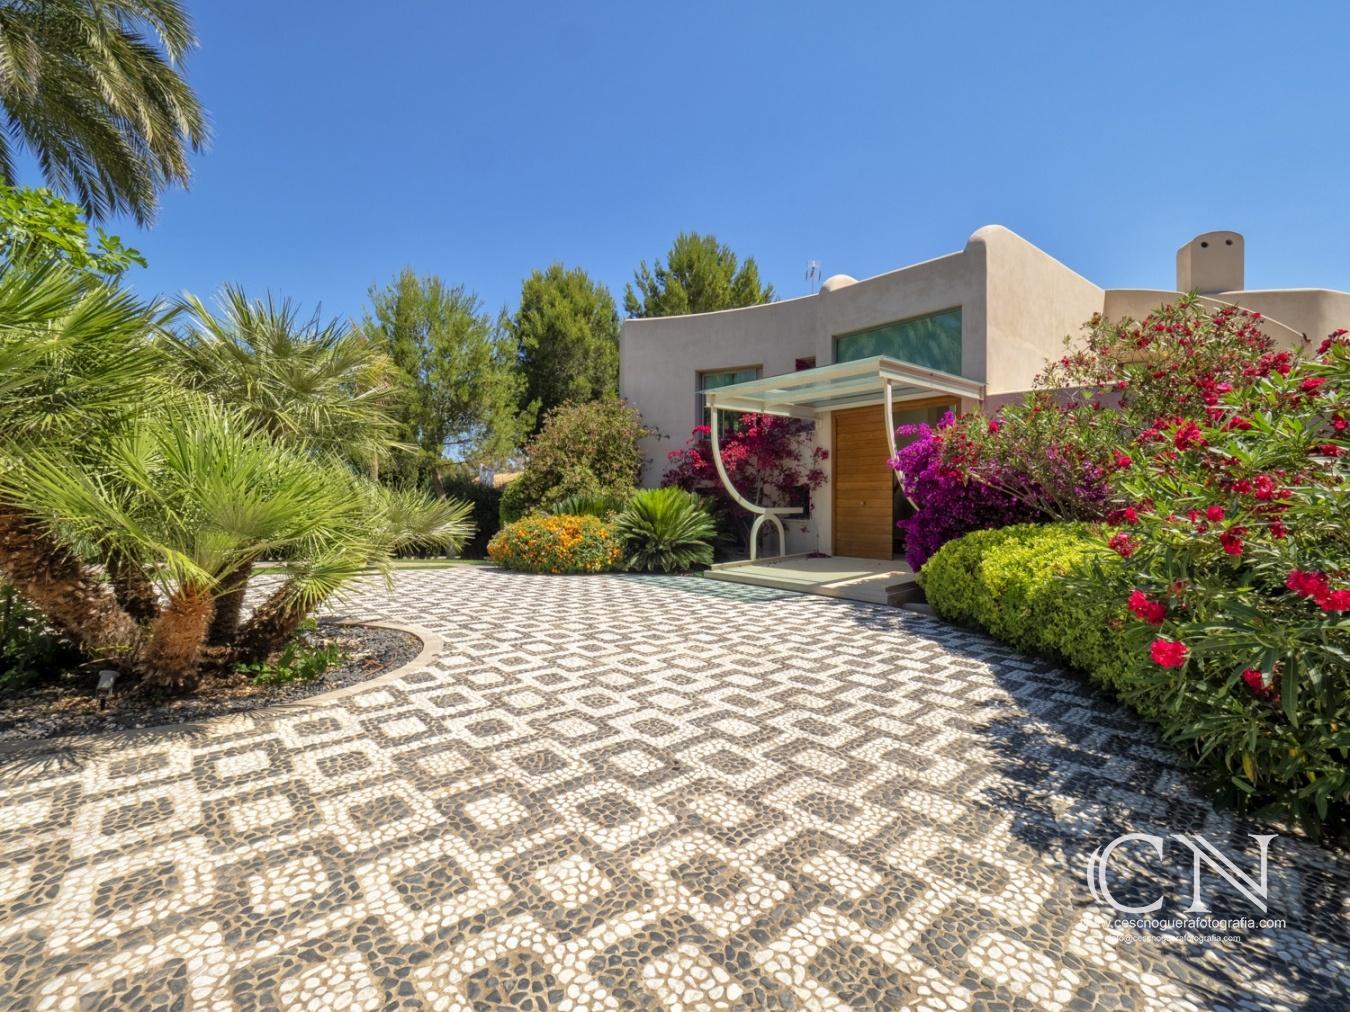 Real Estate  - Cesc Noguera Fotografía, Architectural & Interior design photographer / Landscape Photography